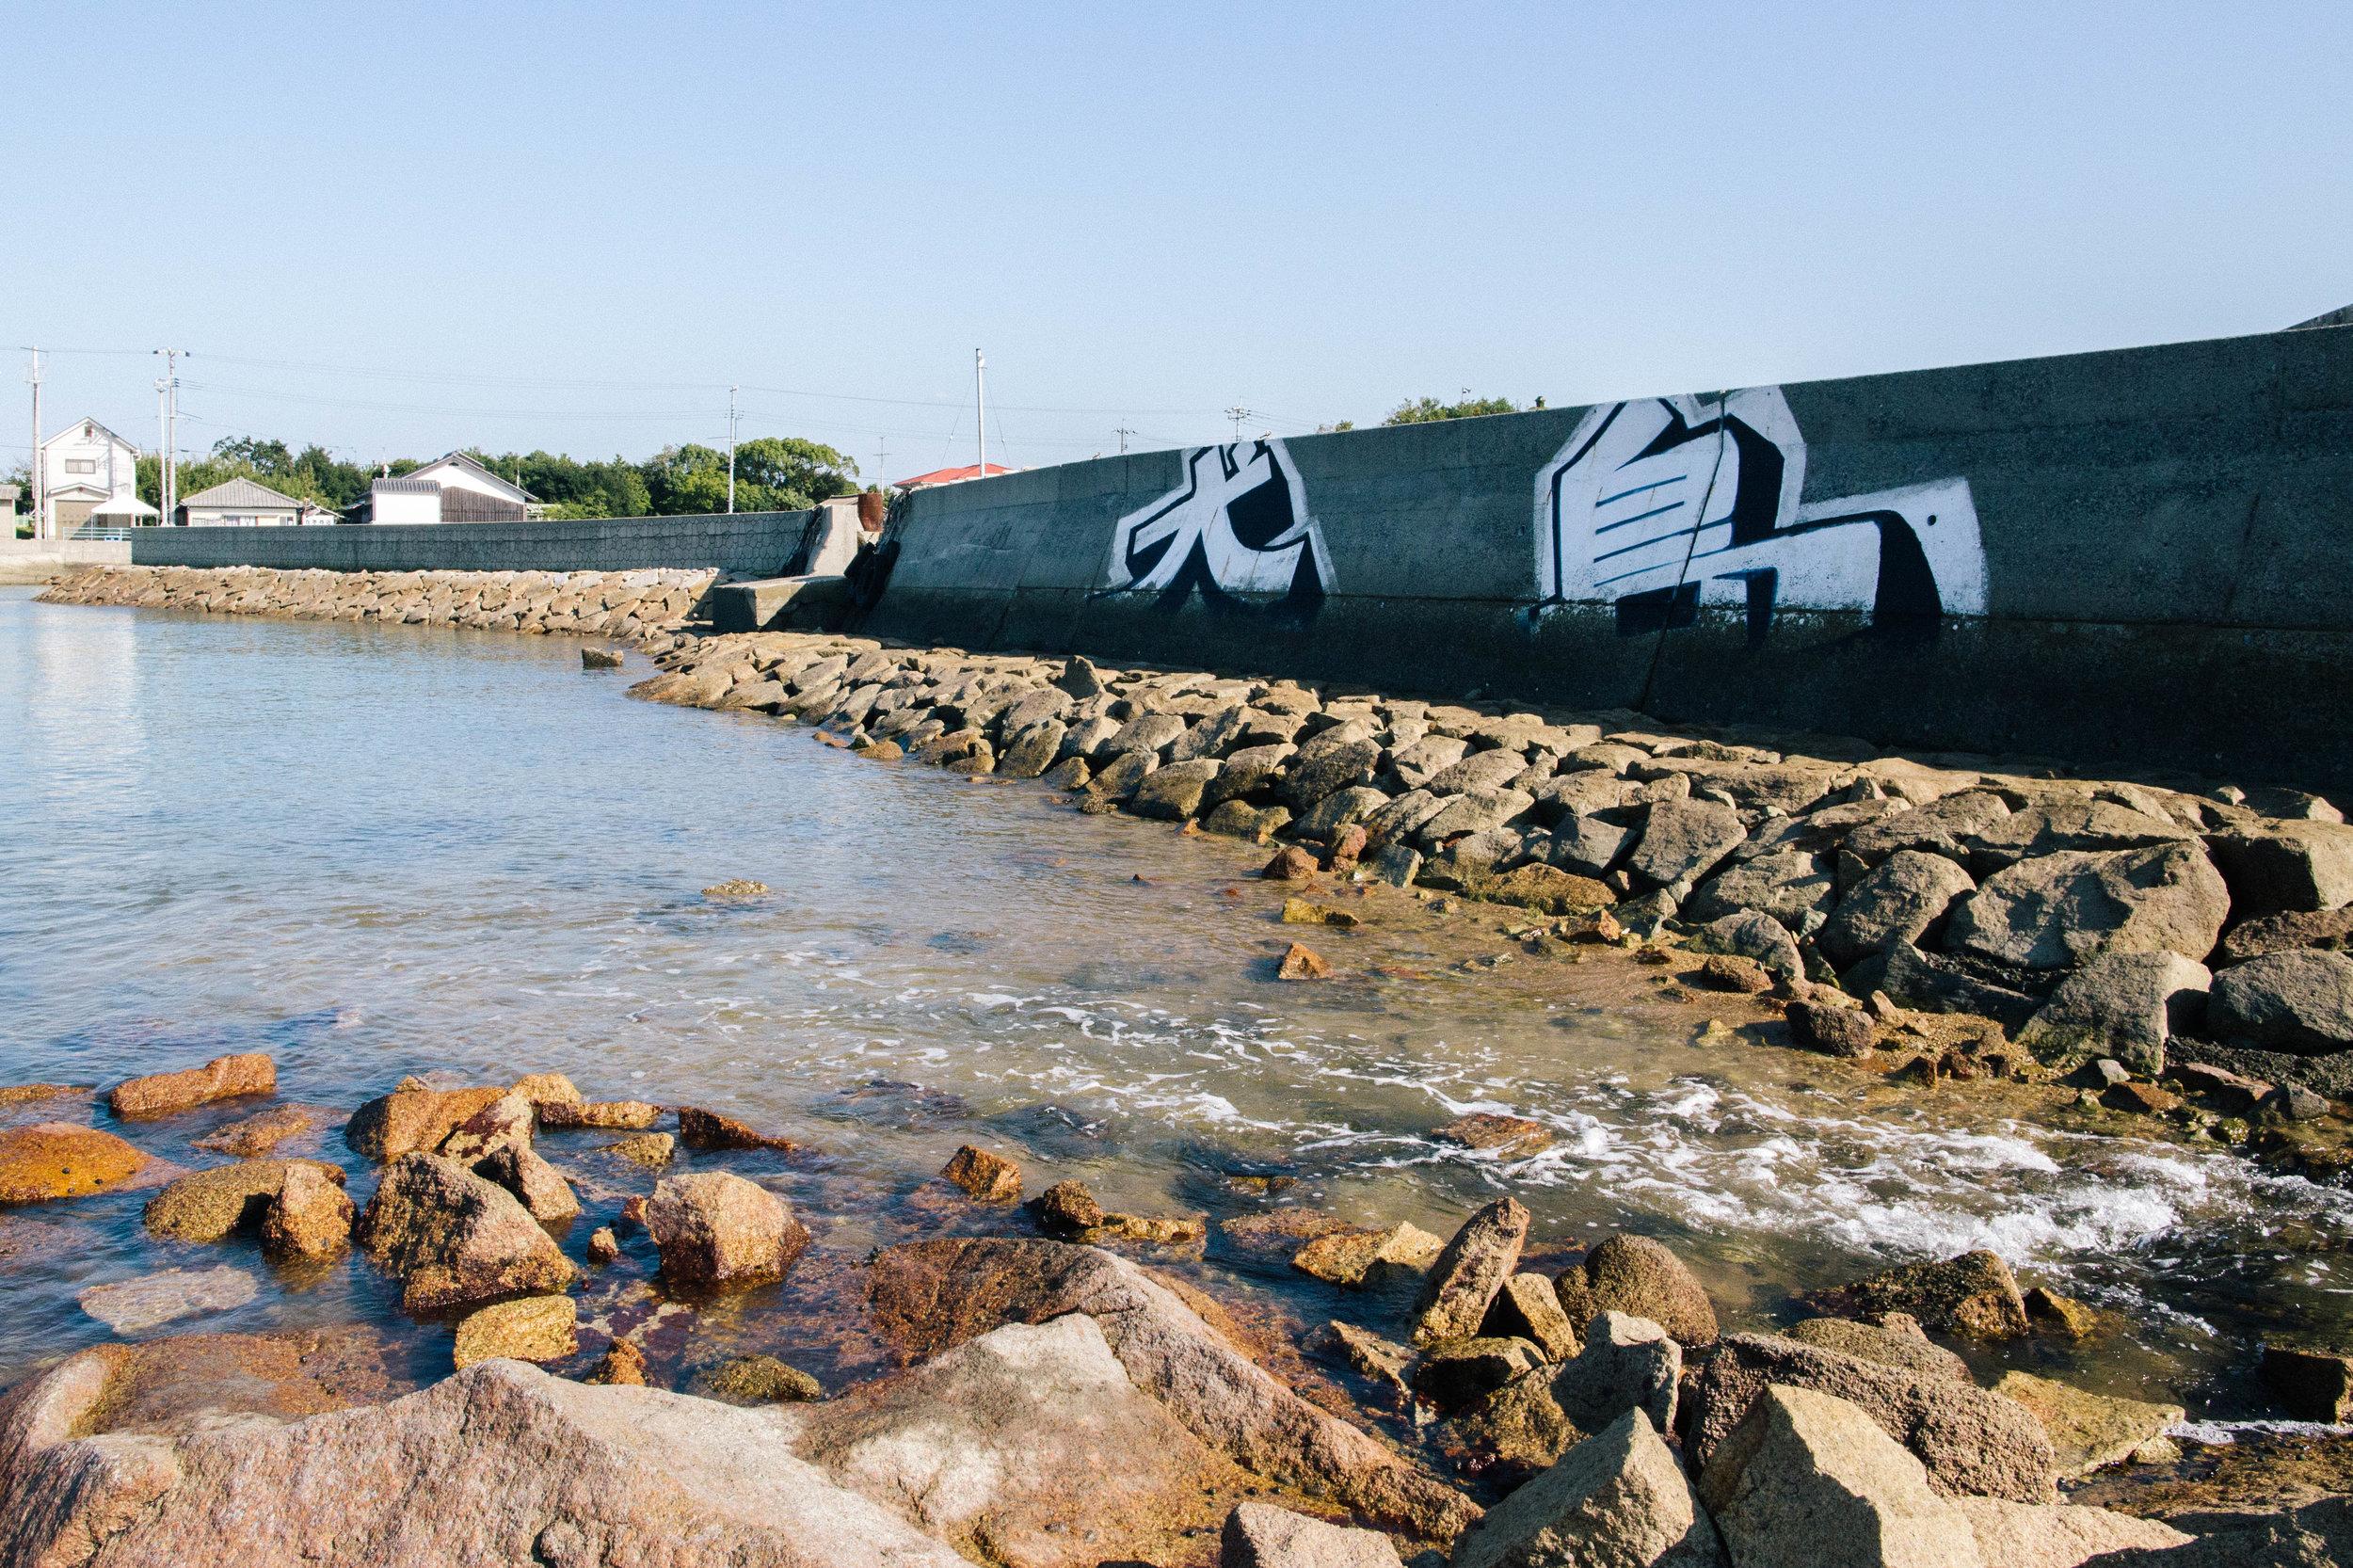 Inujima mural